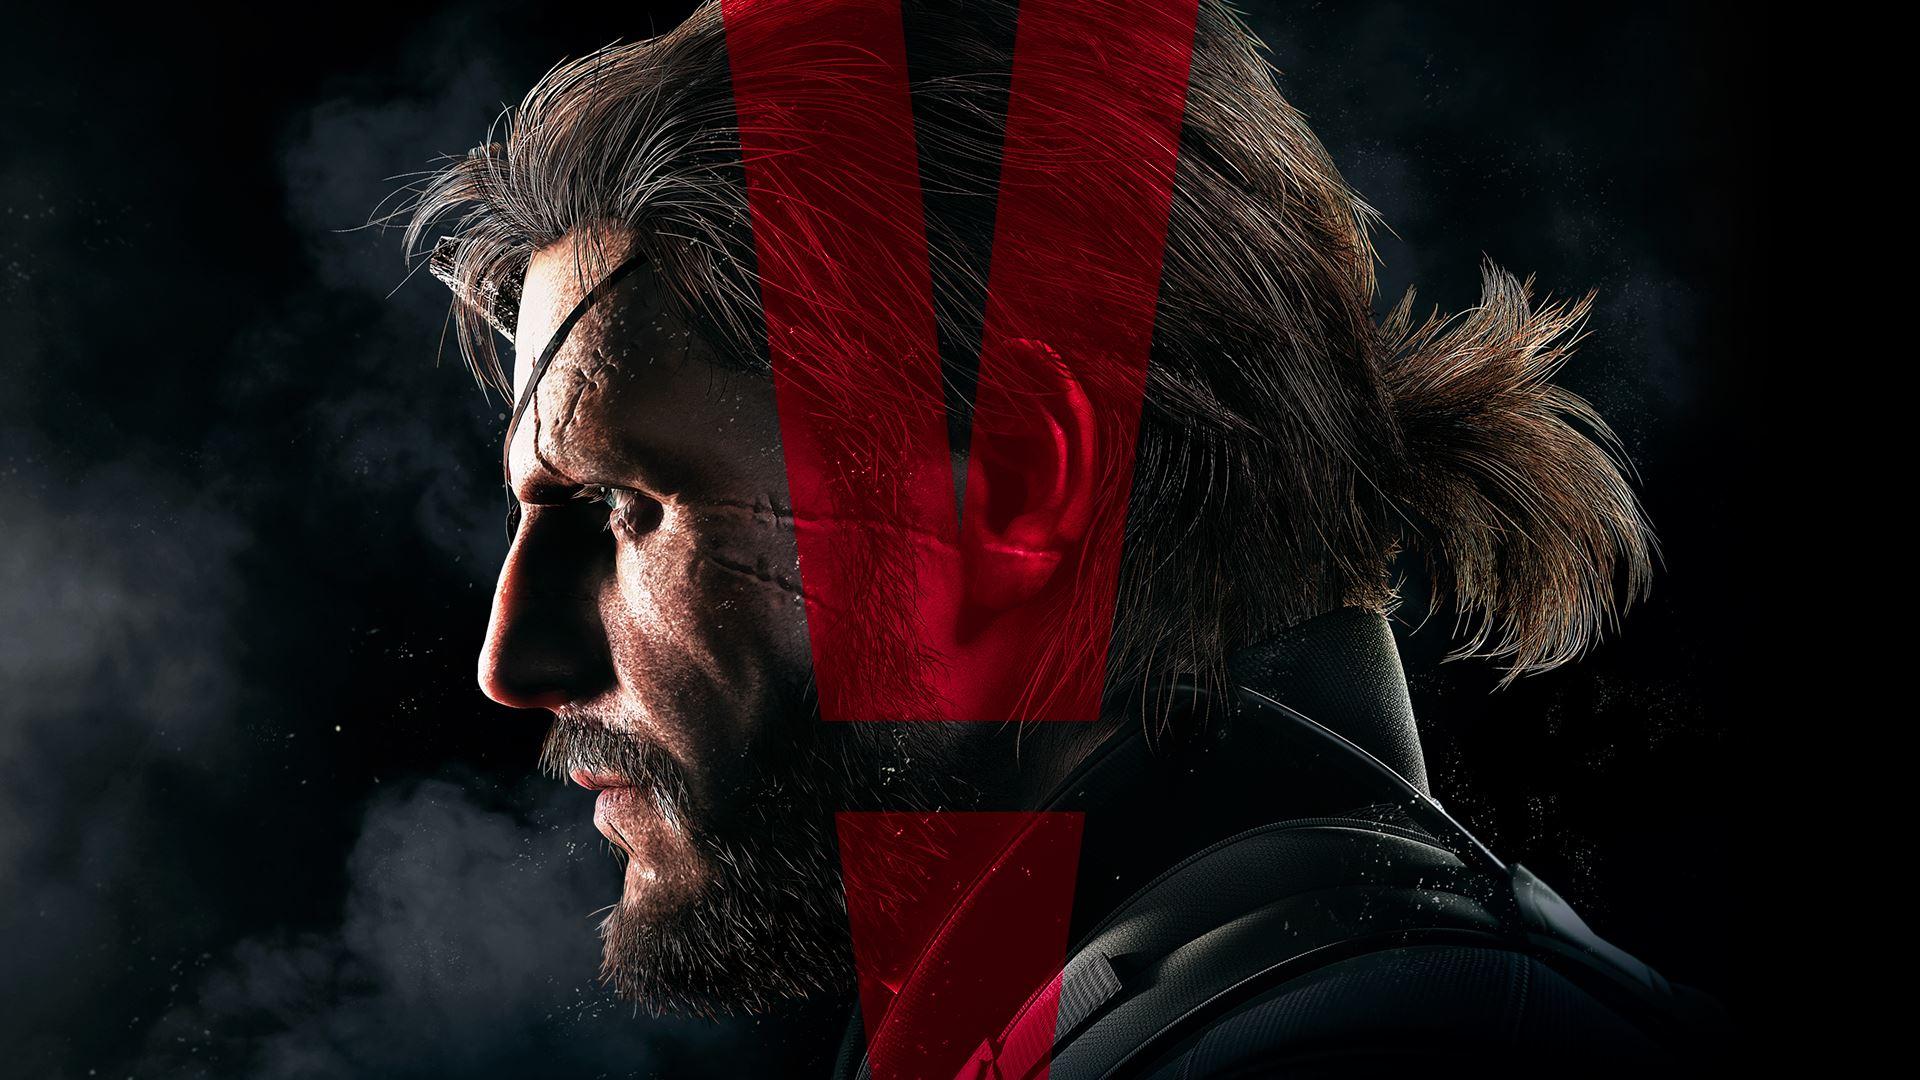 Metal Gear Solid 5: Phantom Pain  Start Time: Dec. 7th, 9:30AM Pacific